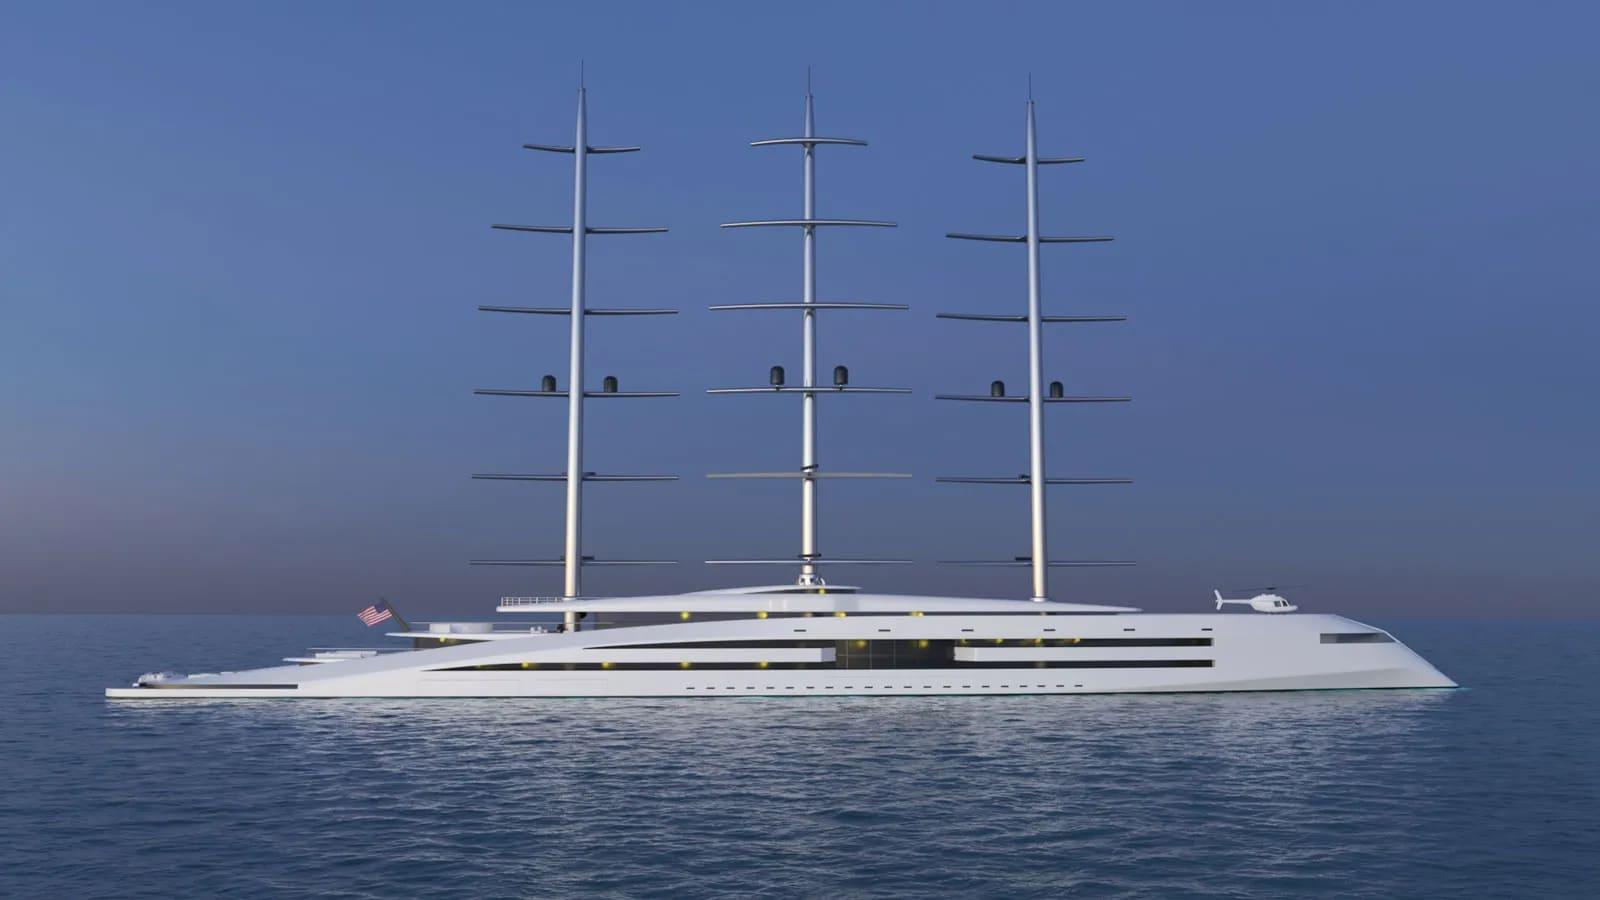 superiate-noruega-boat-shopping-3